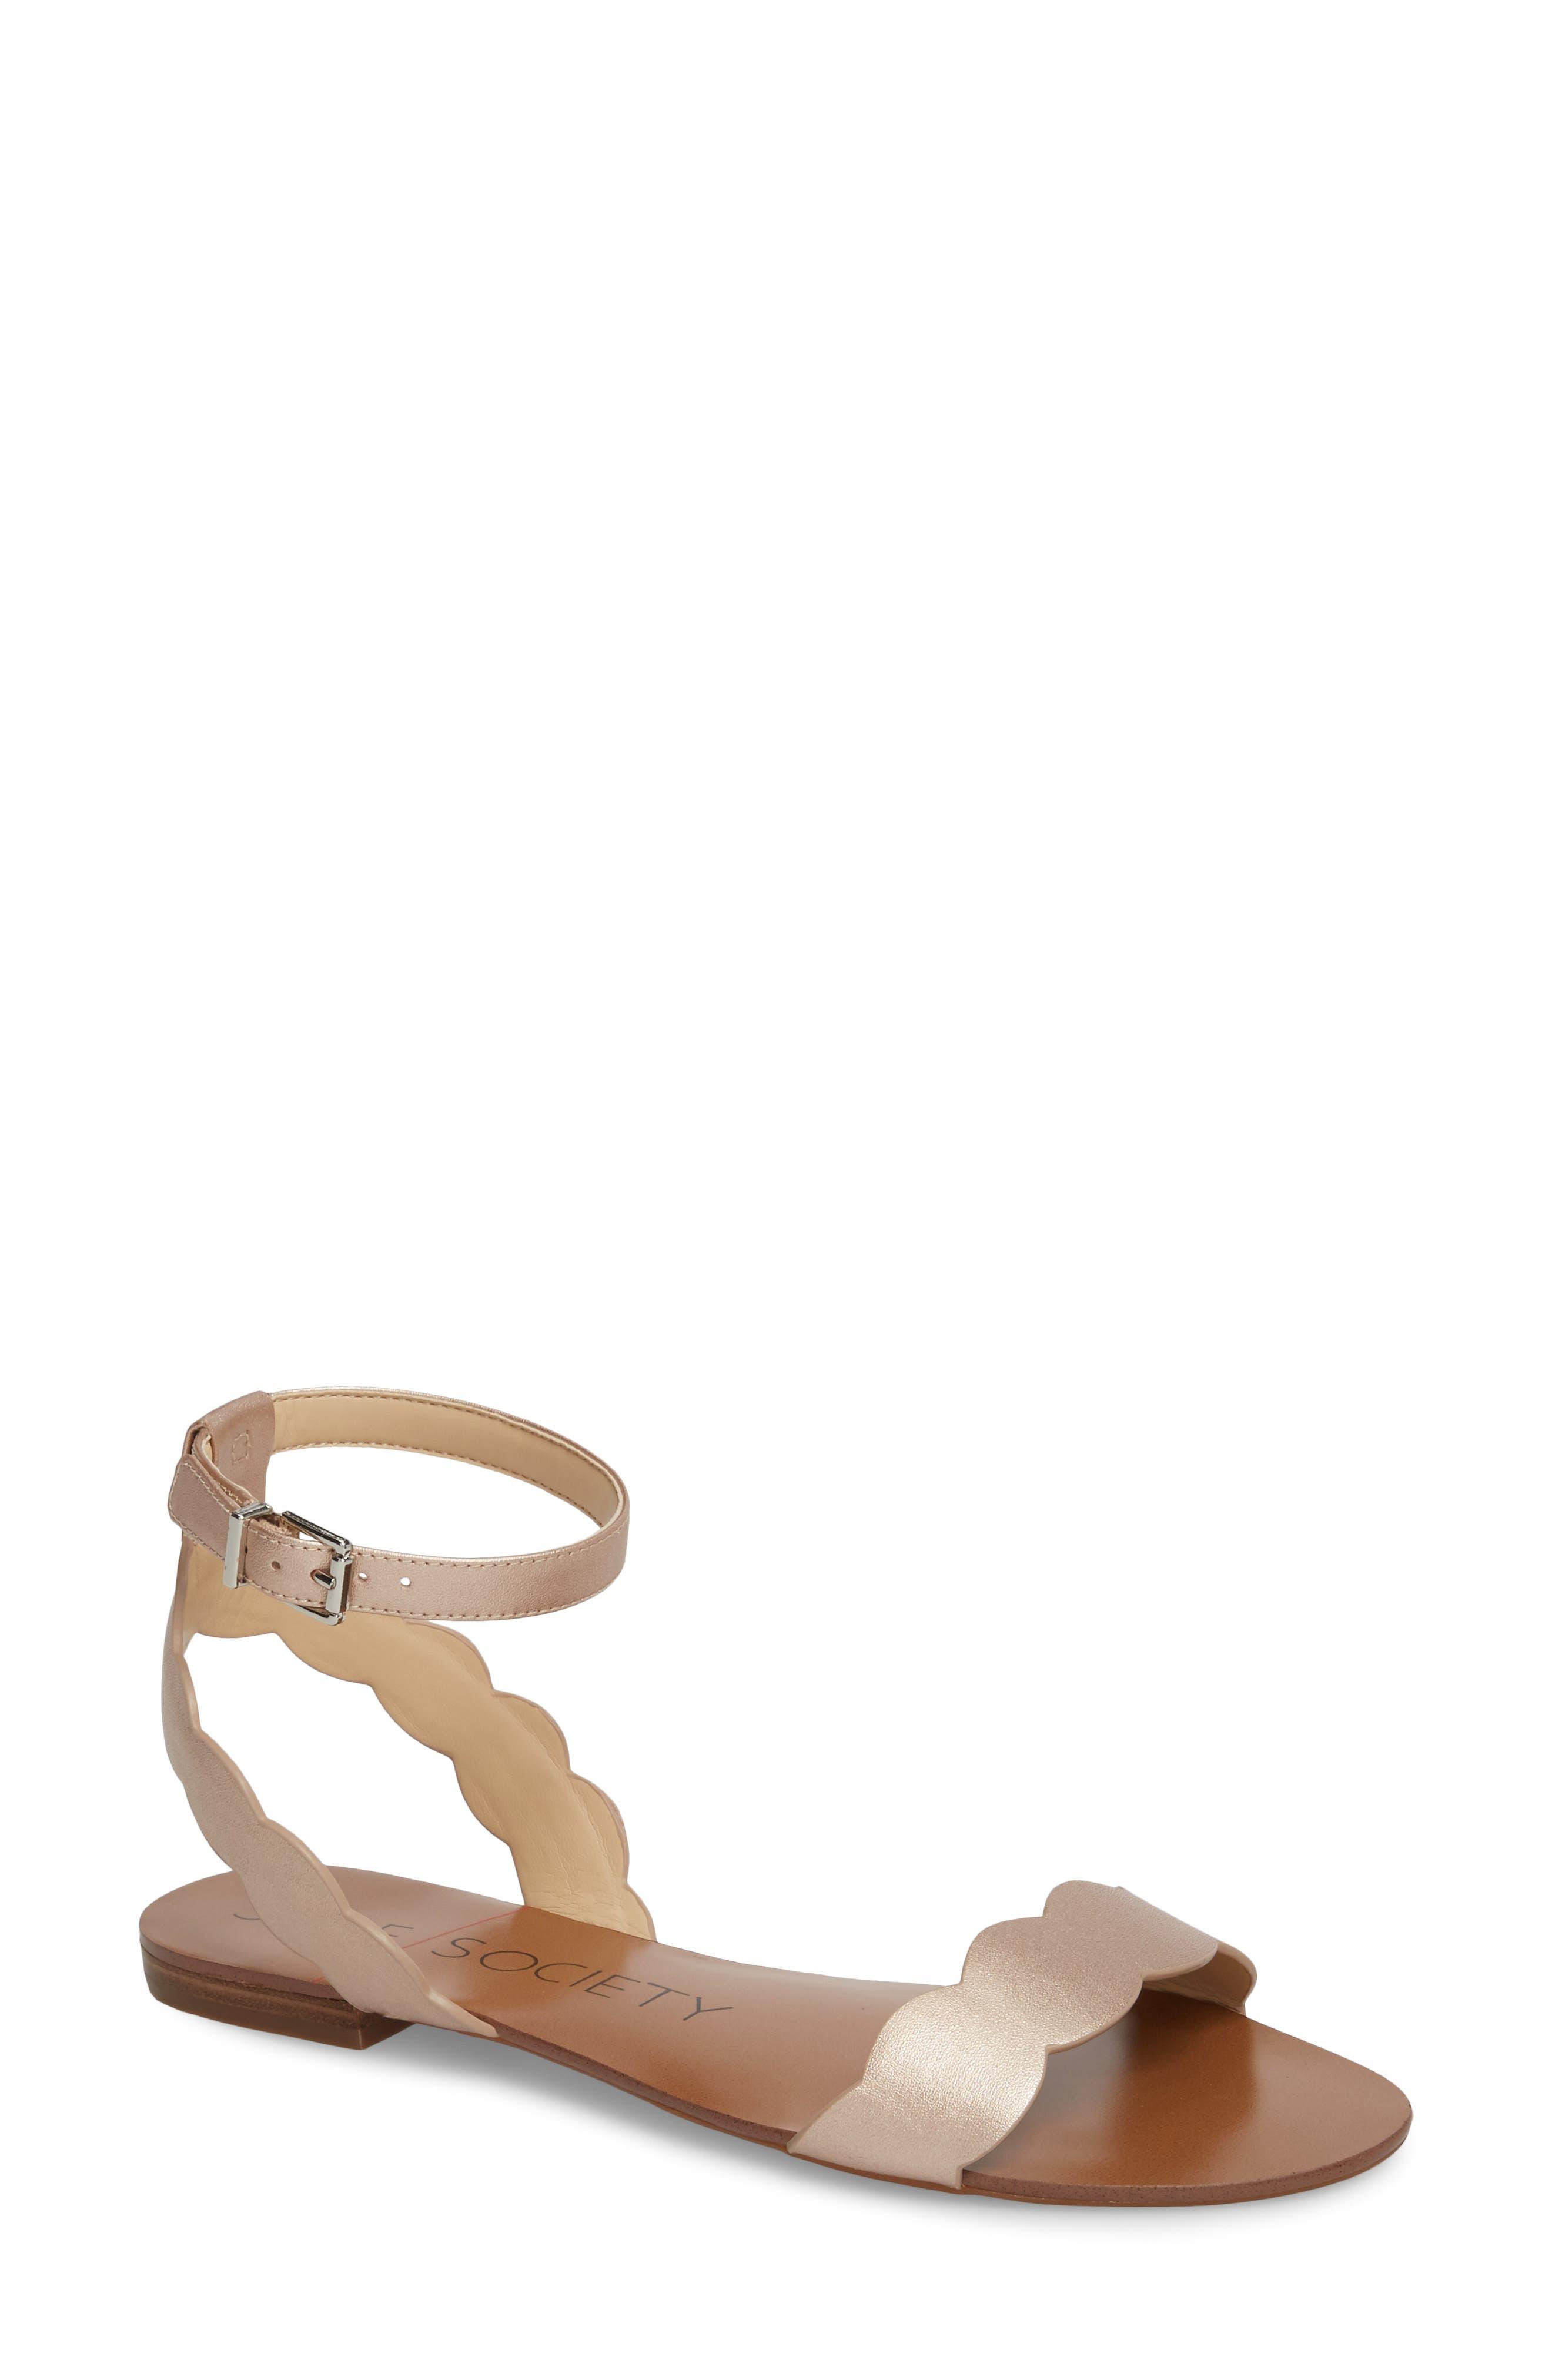 'Odette' Scalloped Ankle Strap Flat Sandal,                             Main thumbnail 1, color,